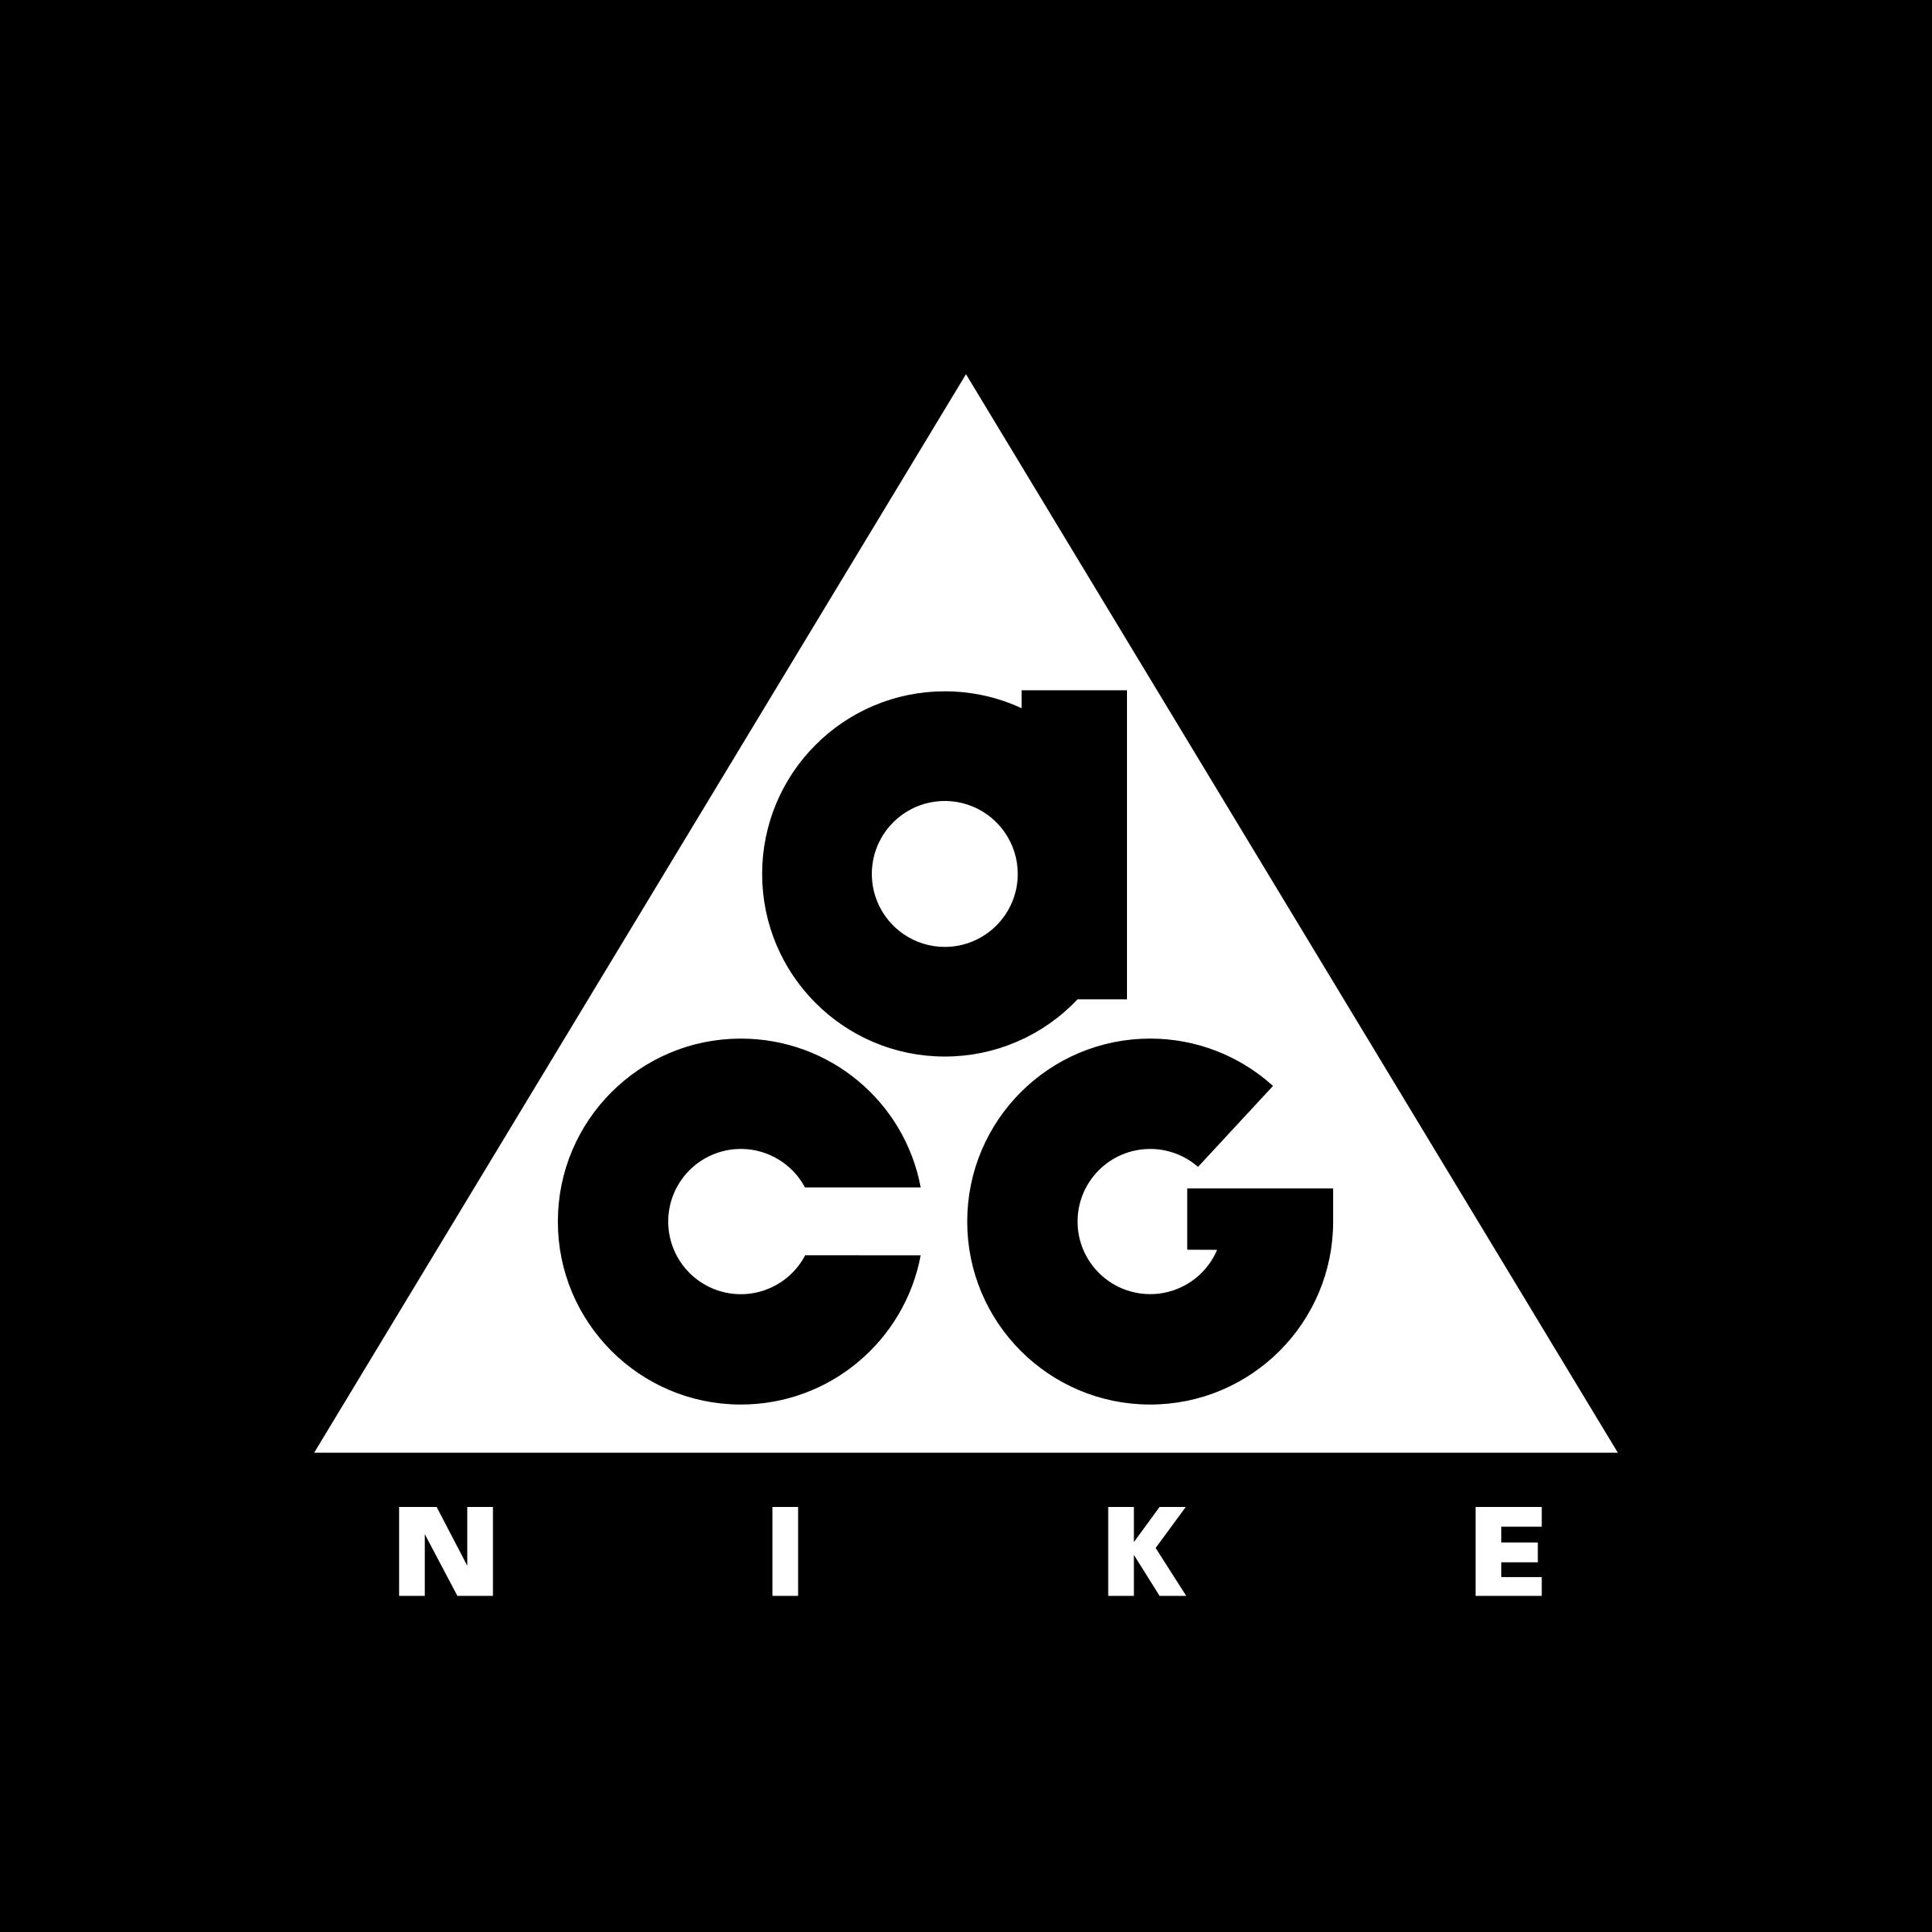 NIKE ACG LOGO | Nike acg, Outdoor logos, Minimalist logo - Japanese Nike Logo